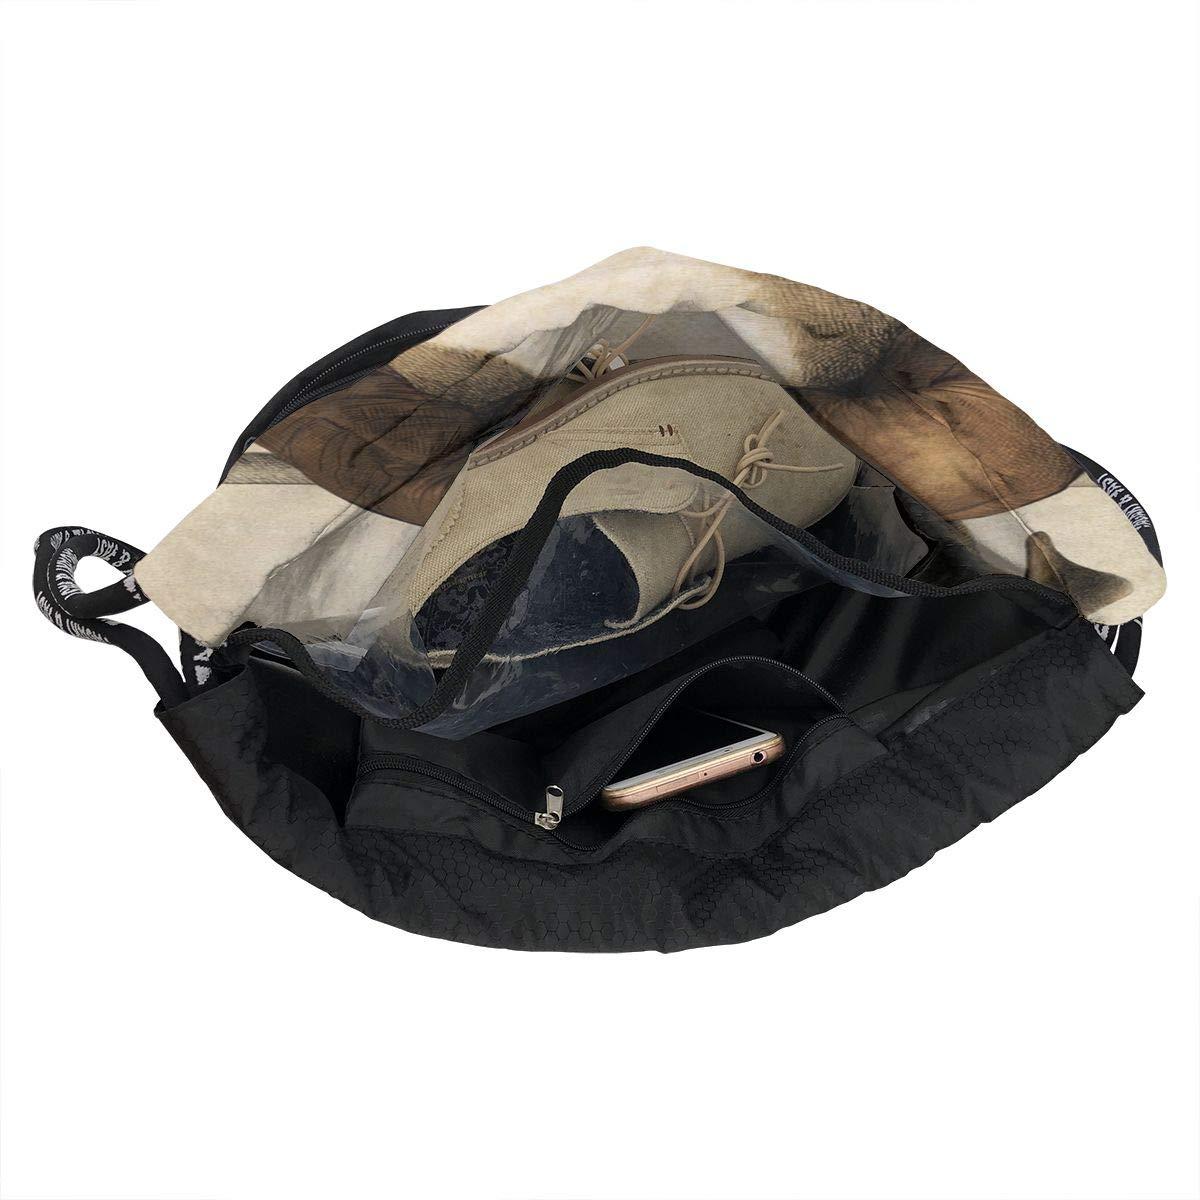 The Dog Boxer Cinch Backpack Sackpack Tote Sack Lightweight Waterproof Large Storage Drawstring Bag For Men /& Women